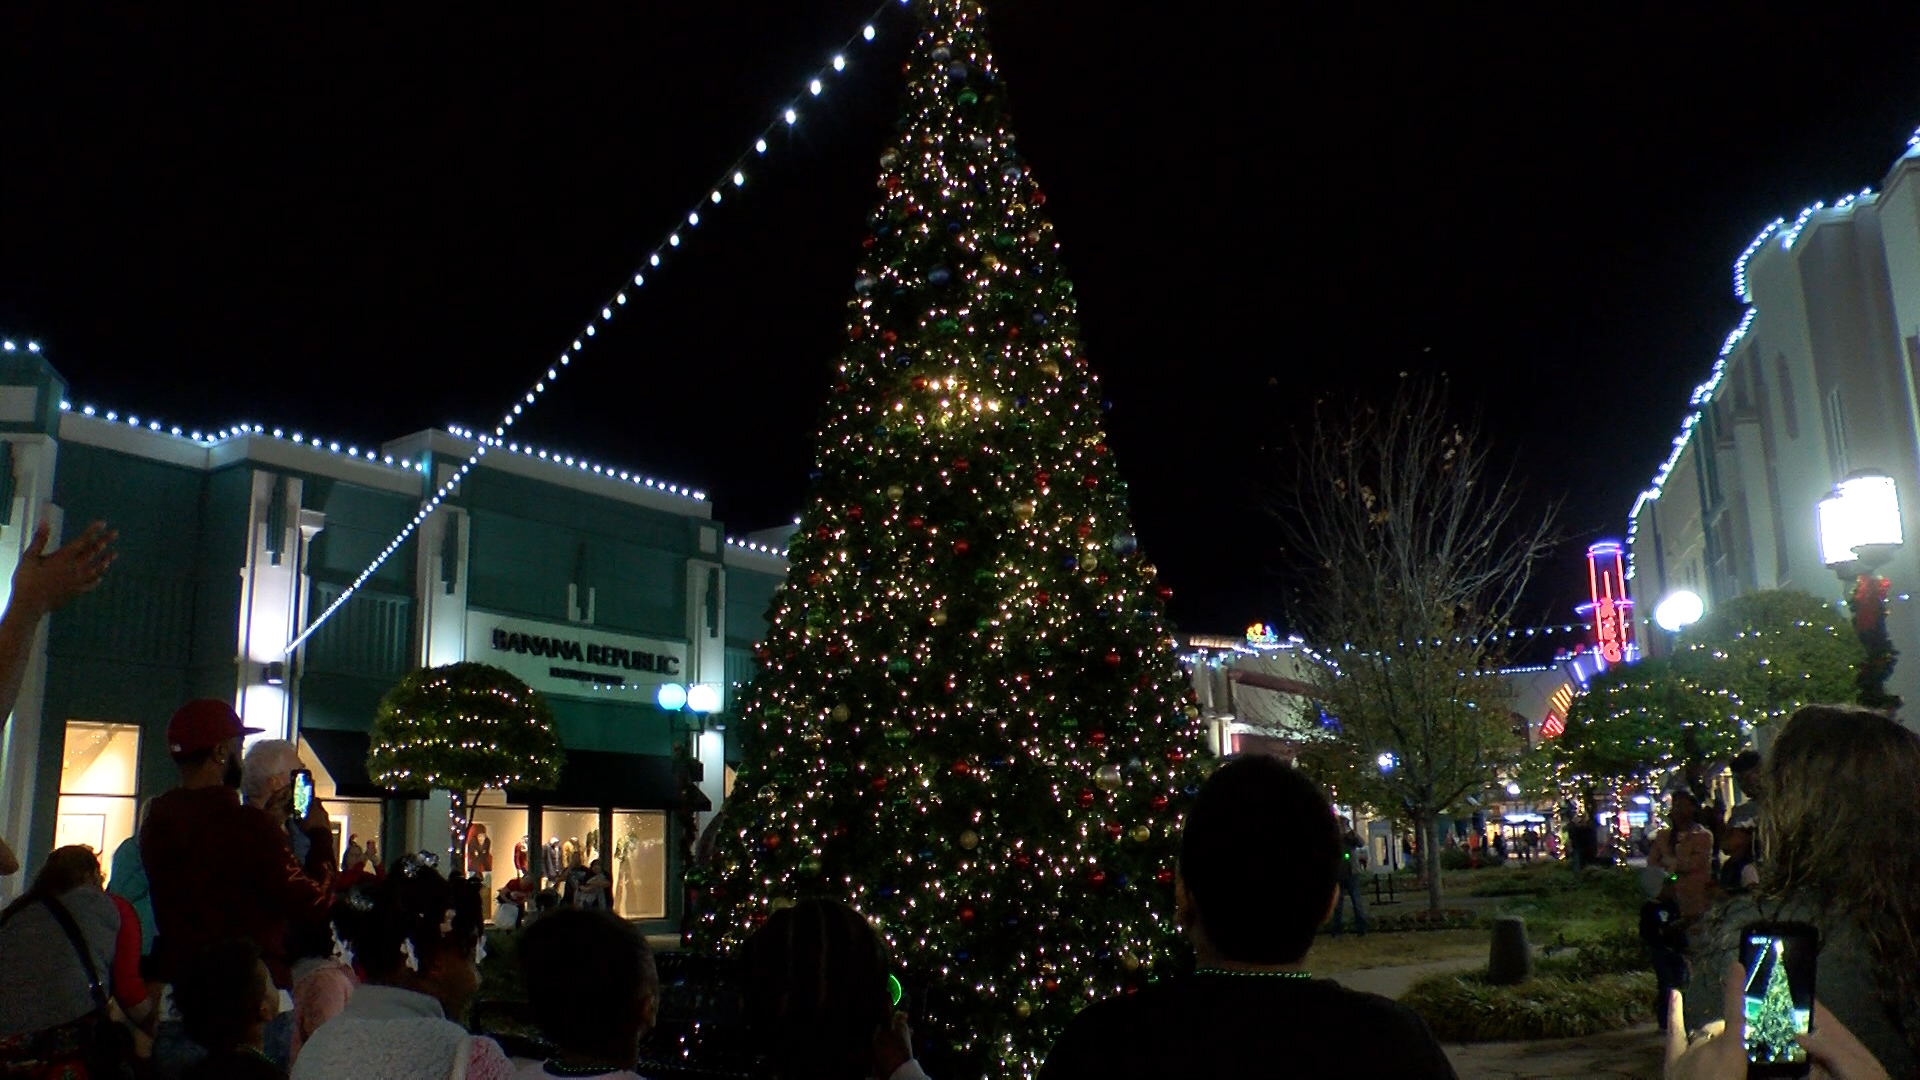 Christmas tree lighting welcomes holiday season to Bossier City